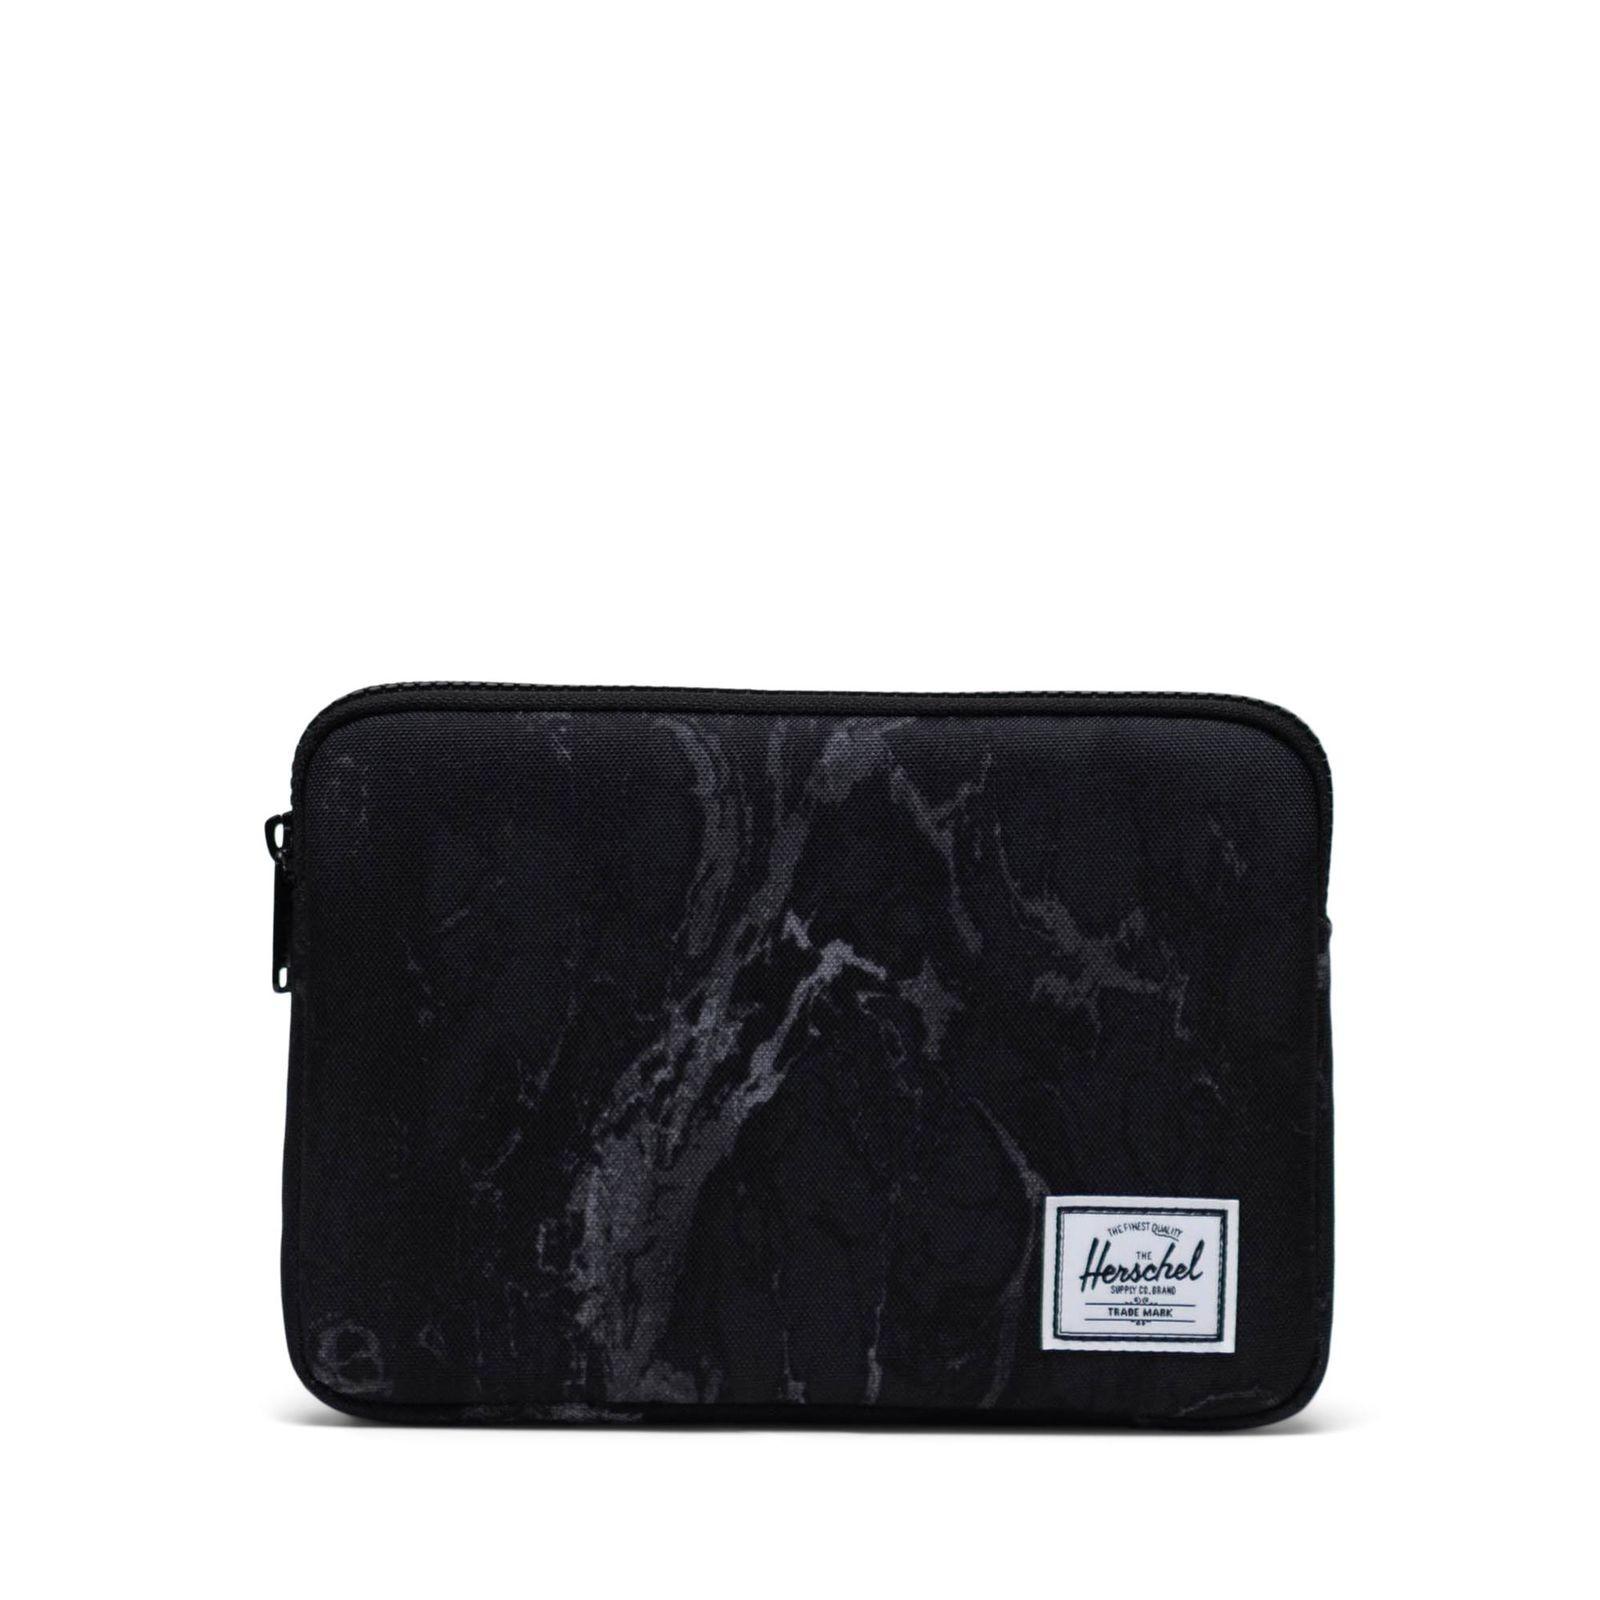 Herschel Laptop Kılıfı Anchor Sleeve for iPad Mini Black Marble